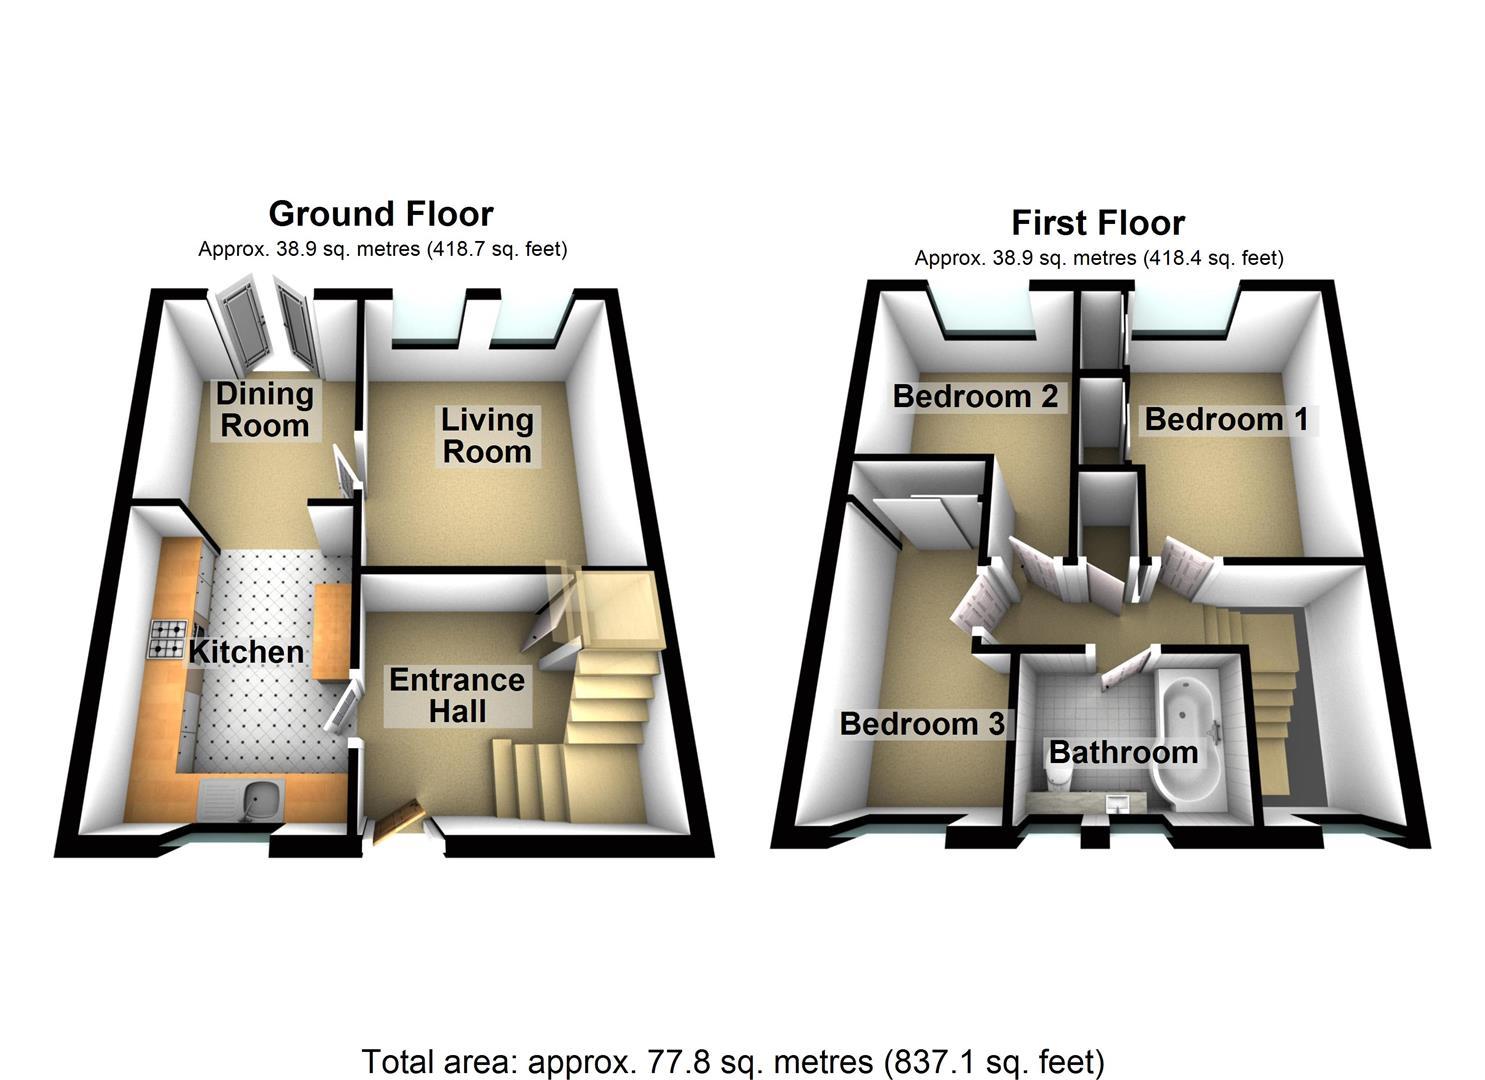 Ingra Walk Roborough Plymouth Pl6 3 Bedroom Terraced